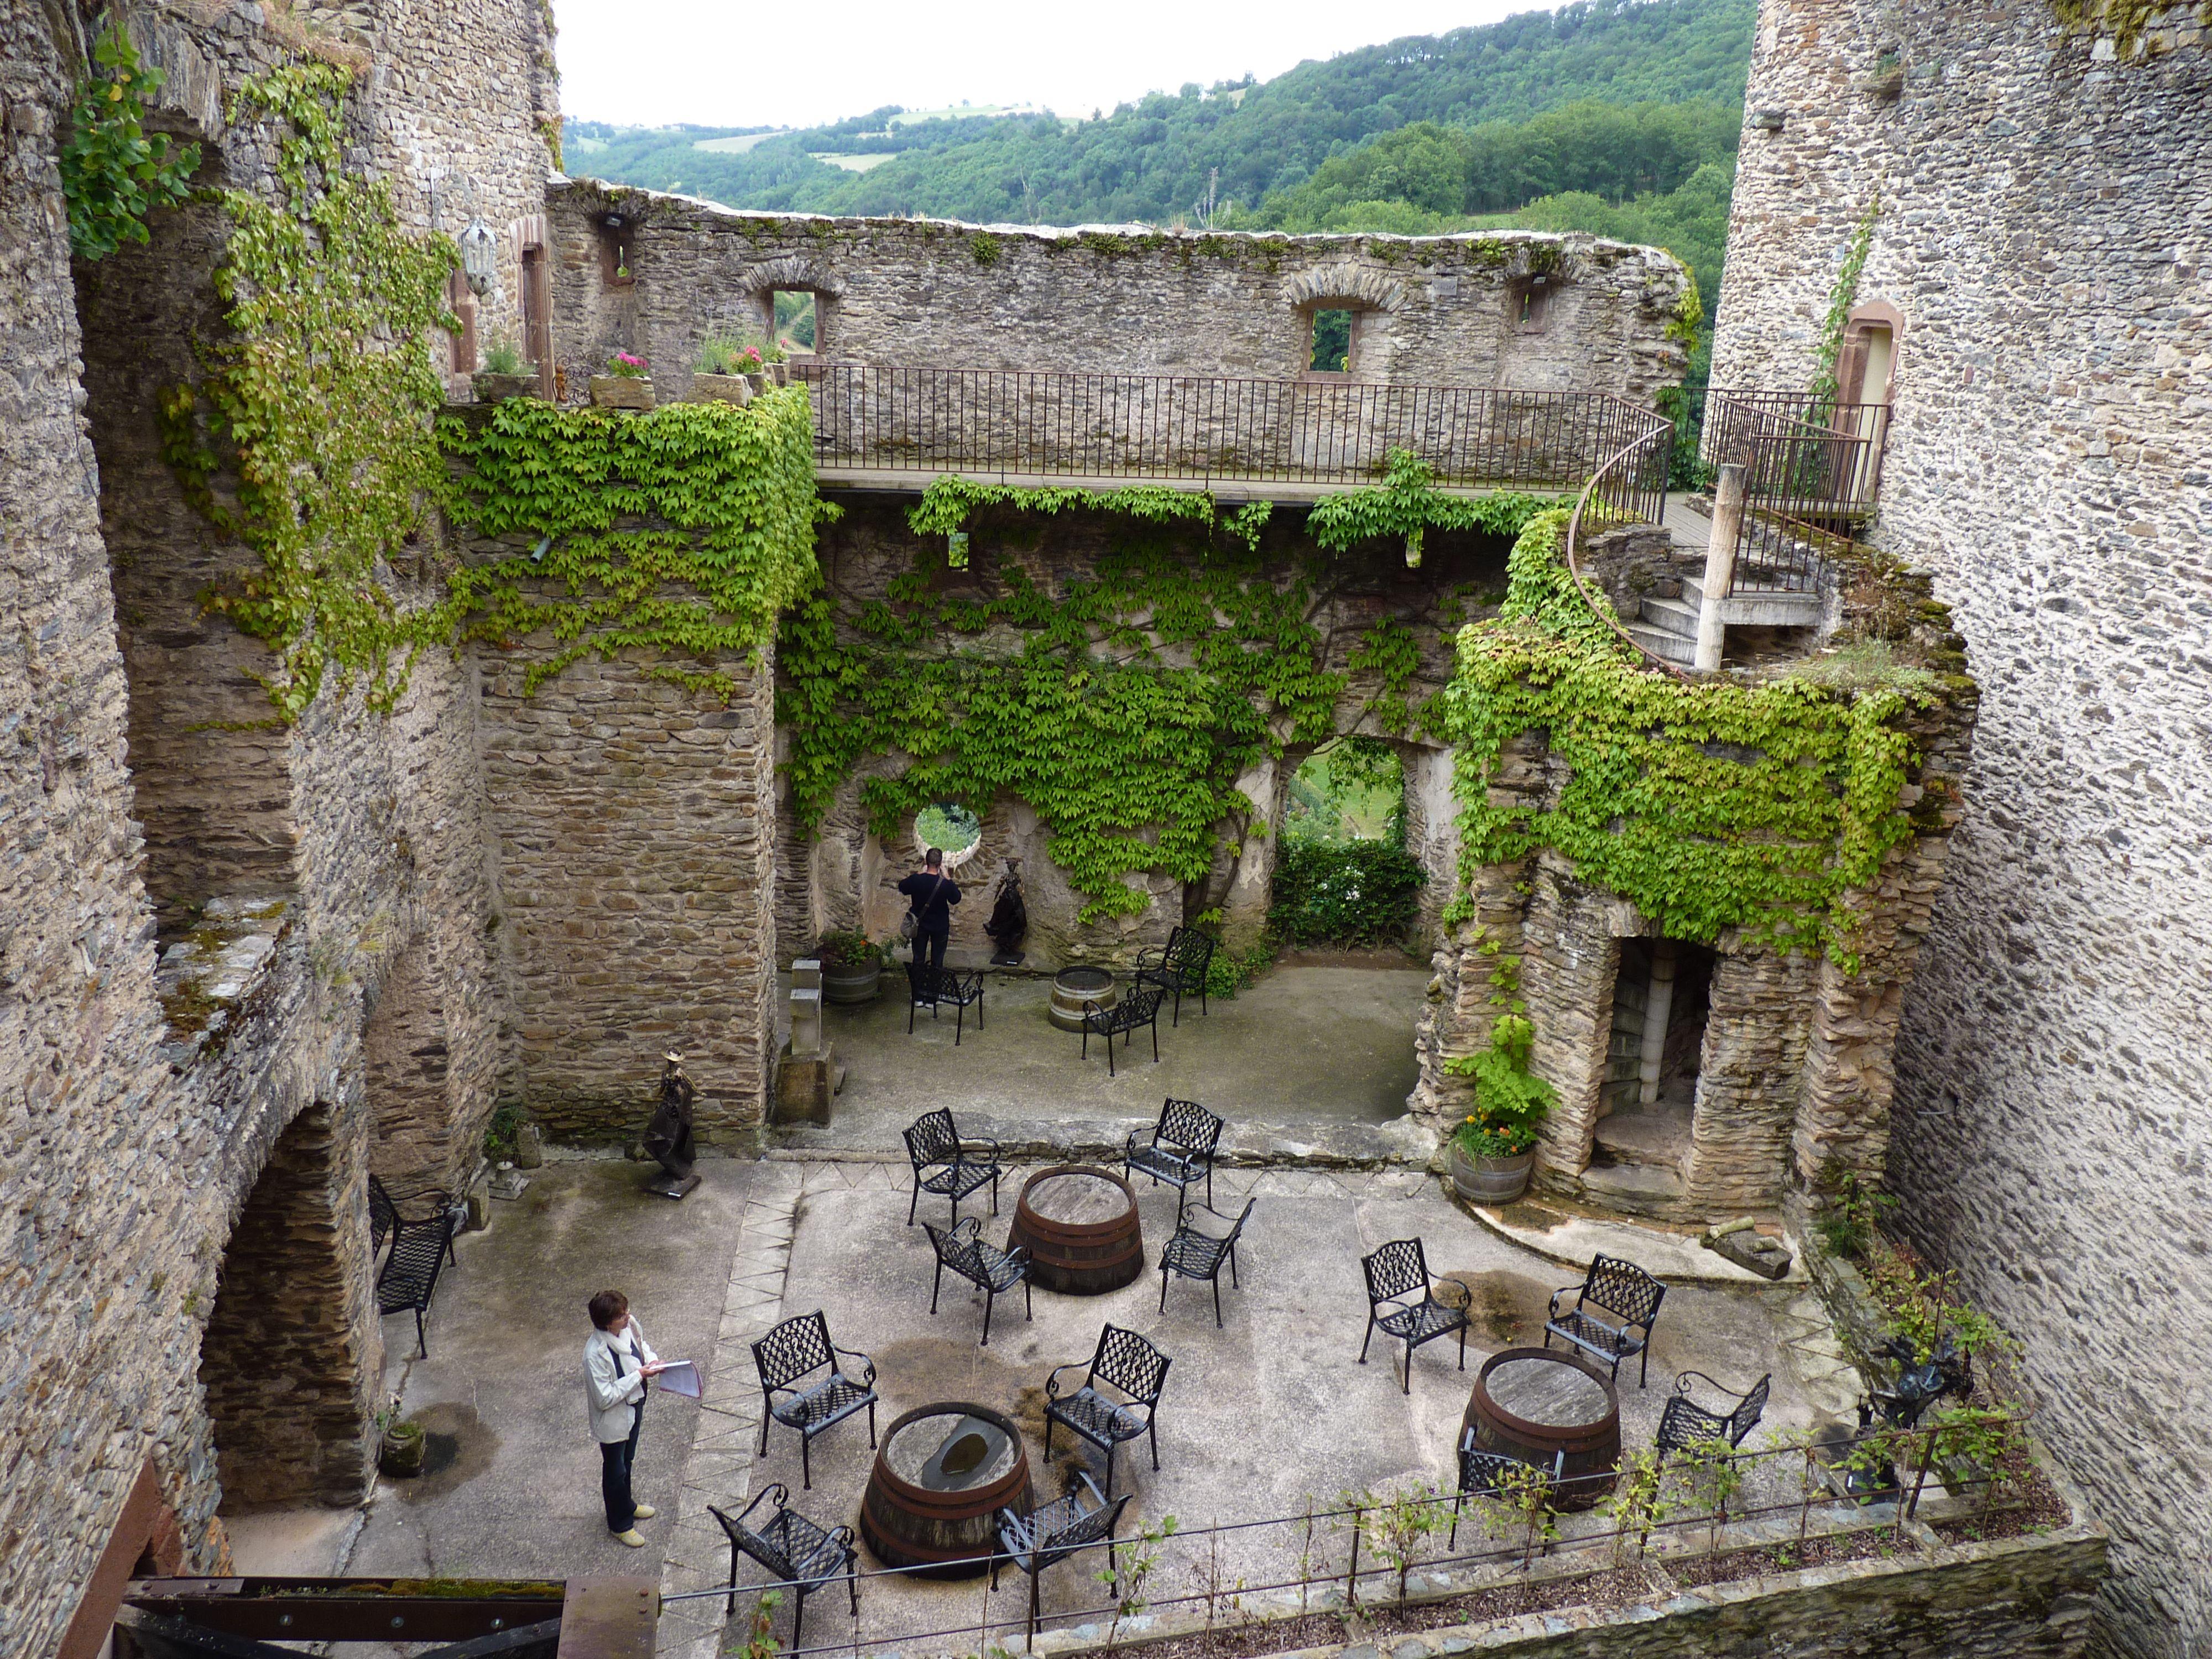 Château de Belcastel, Belcastel, Rignac, Rodez, Aveyron